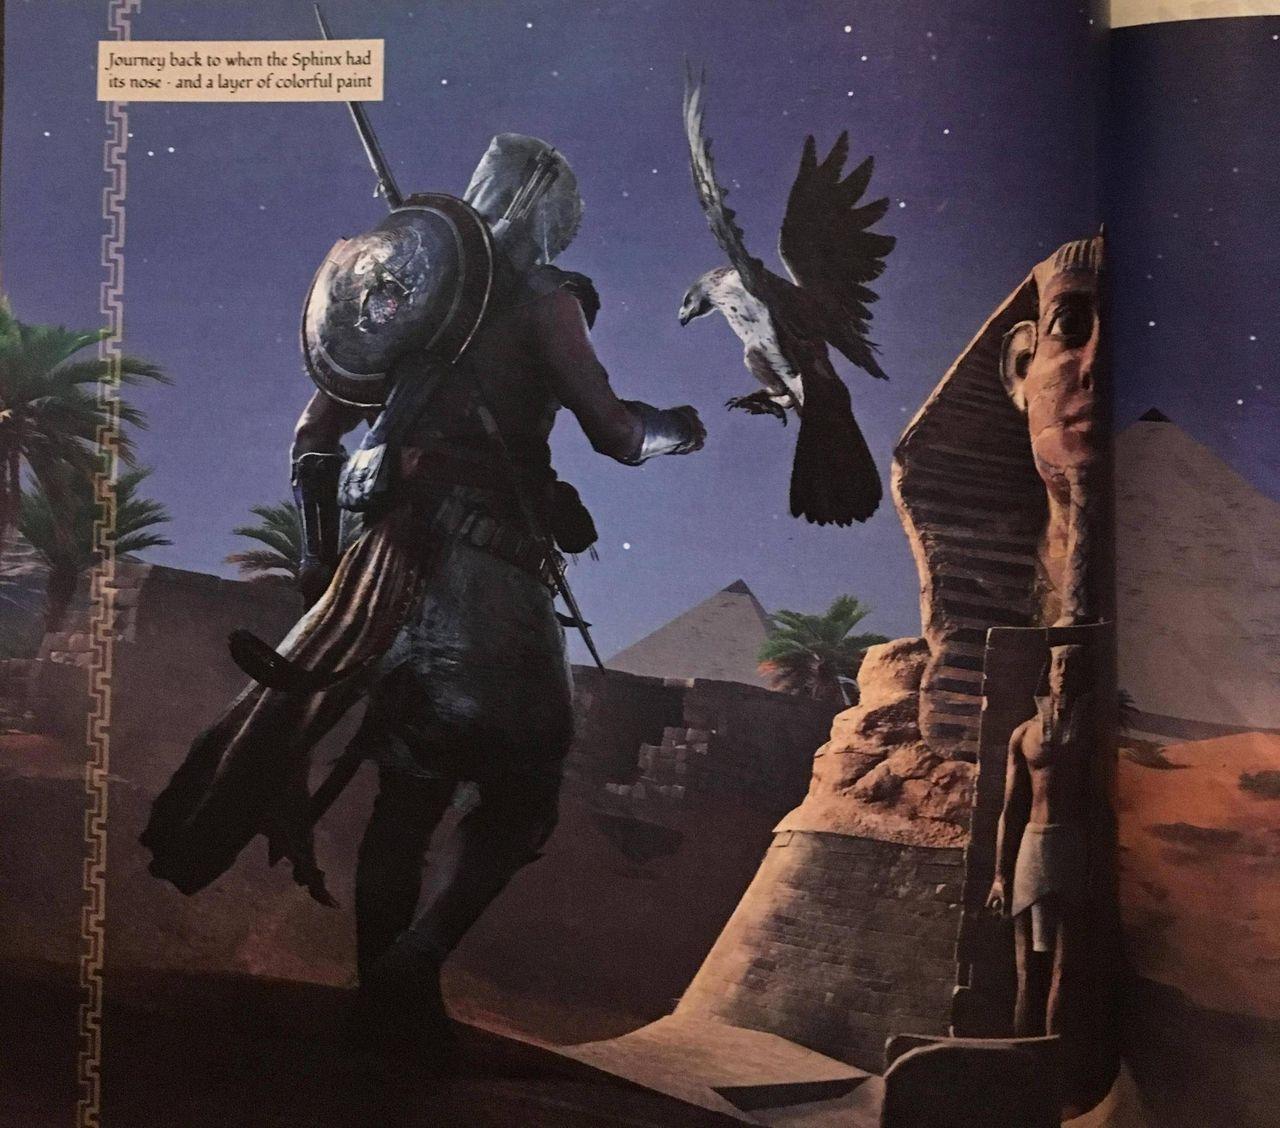 conoce6-la-fecha-lanzamiento-assassins-creed-origins-frikigamers.com